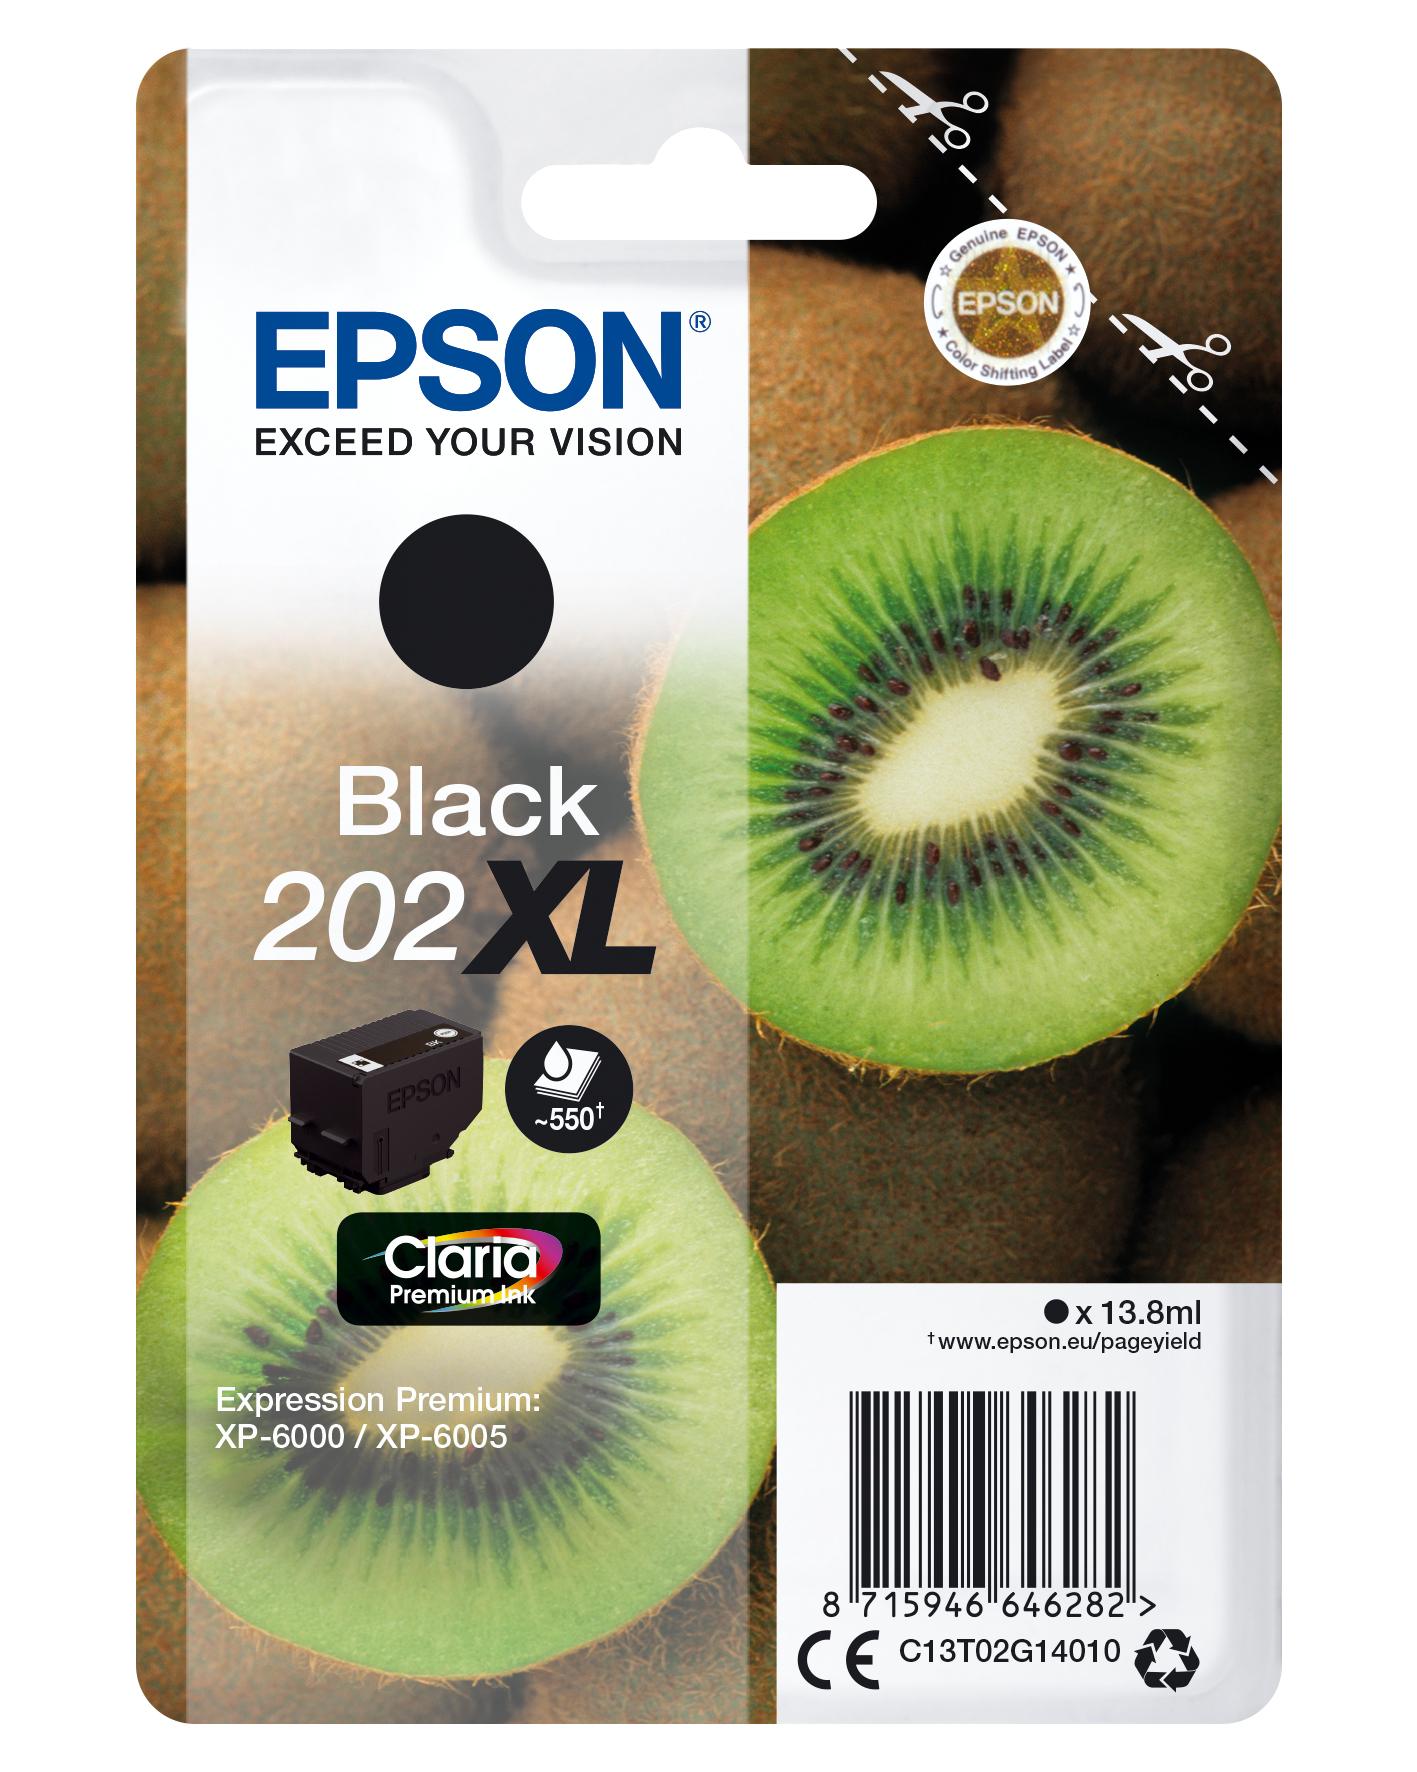 Epson-C13T02G14020-Kiwi-Singlepack-Black-202XL-Claria-Premium-Ink-Original thumbnail 2